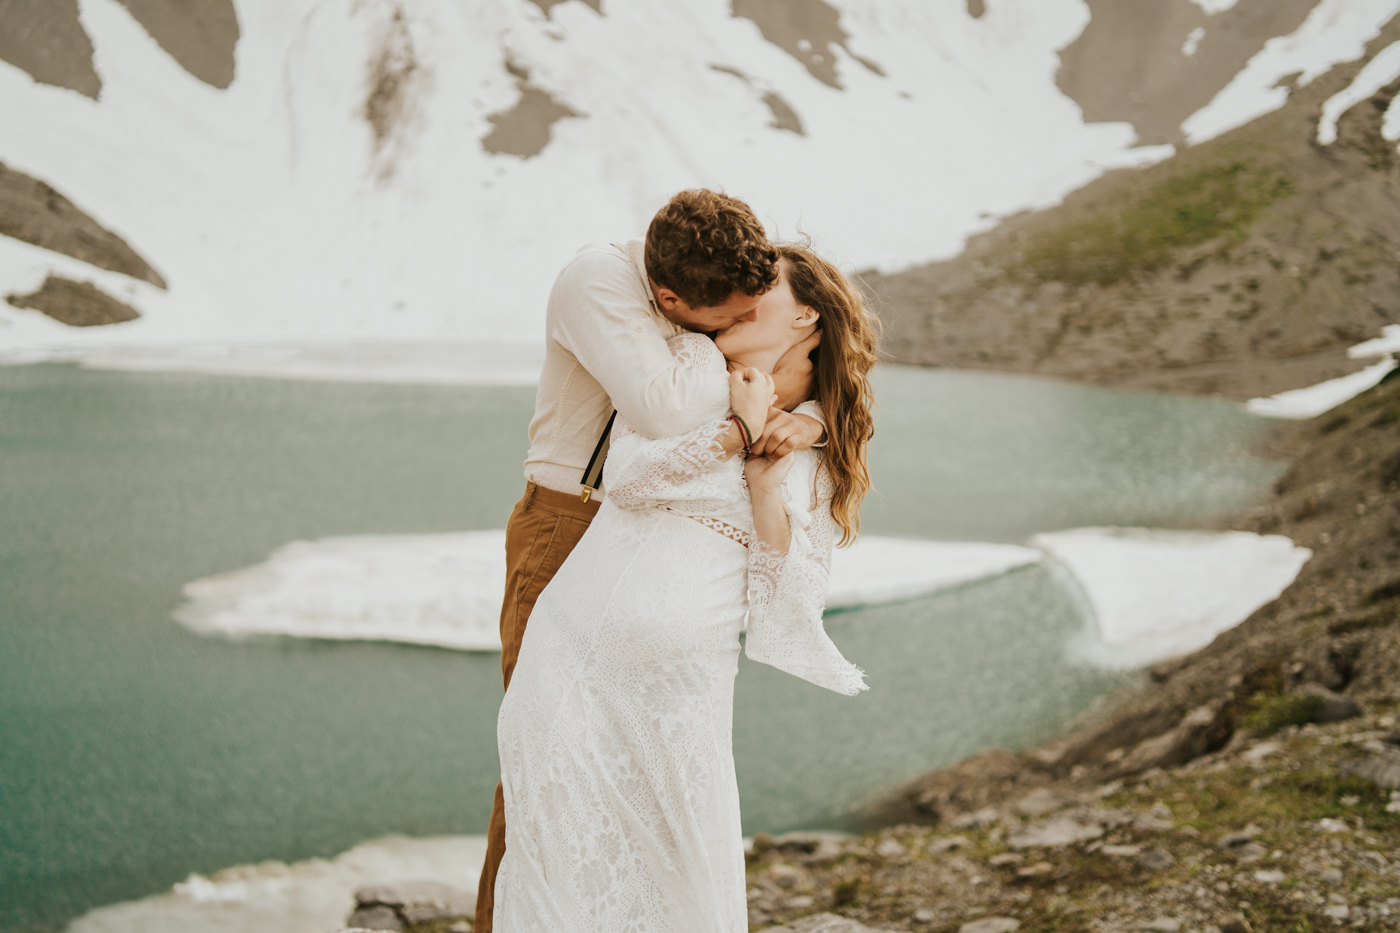 tyraephotography_photographer_wedding_elopement_engagement_photography-07712.jpg